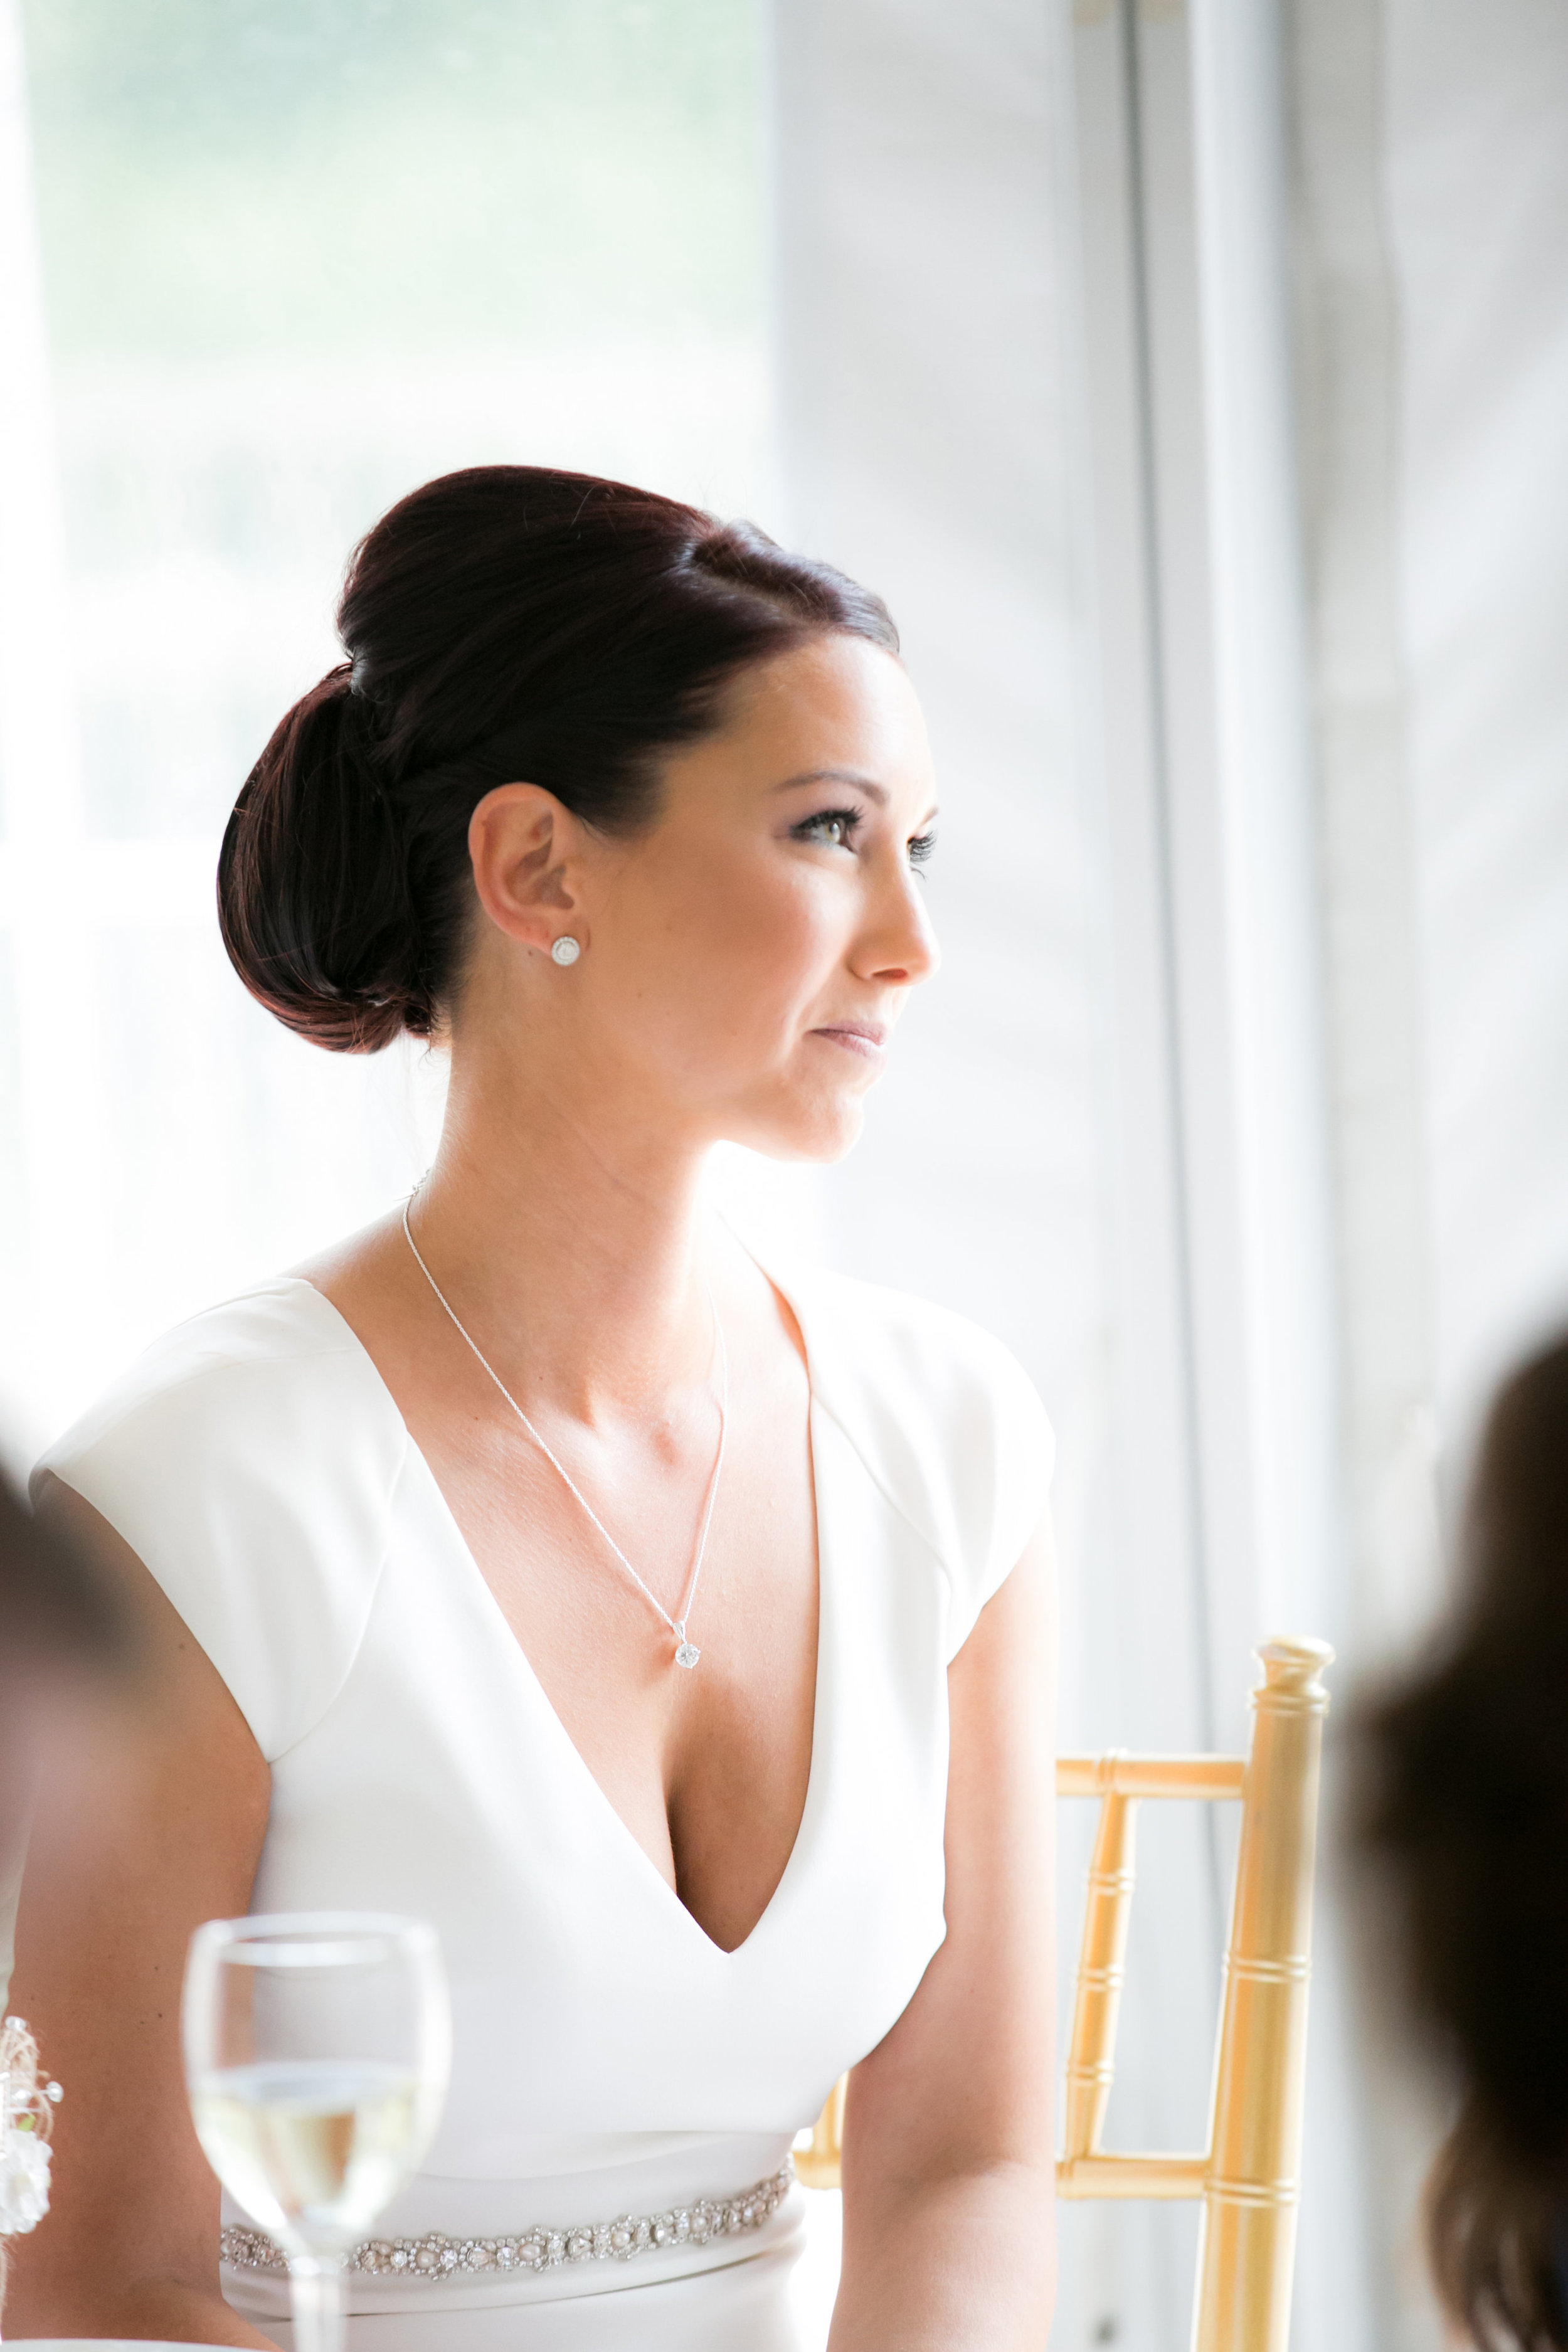 Pure elegance events Tynise Kee dc wedding planner va wedding planner rust manor house leesburg -0059.jpg